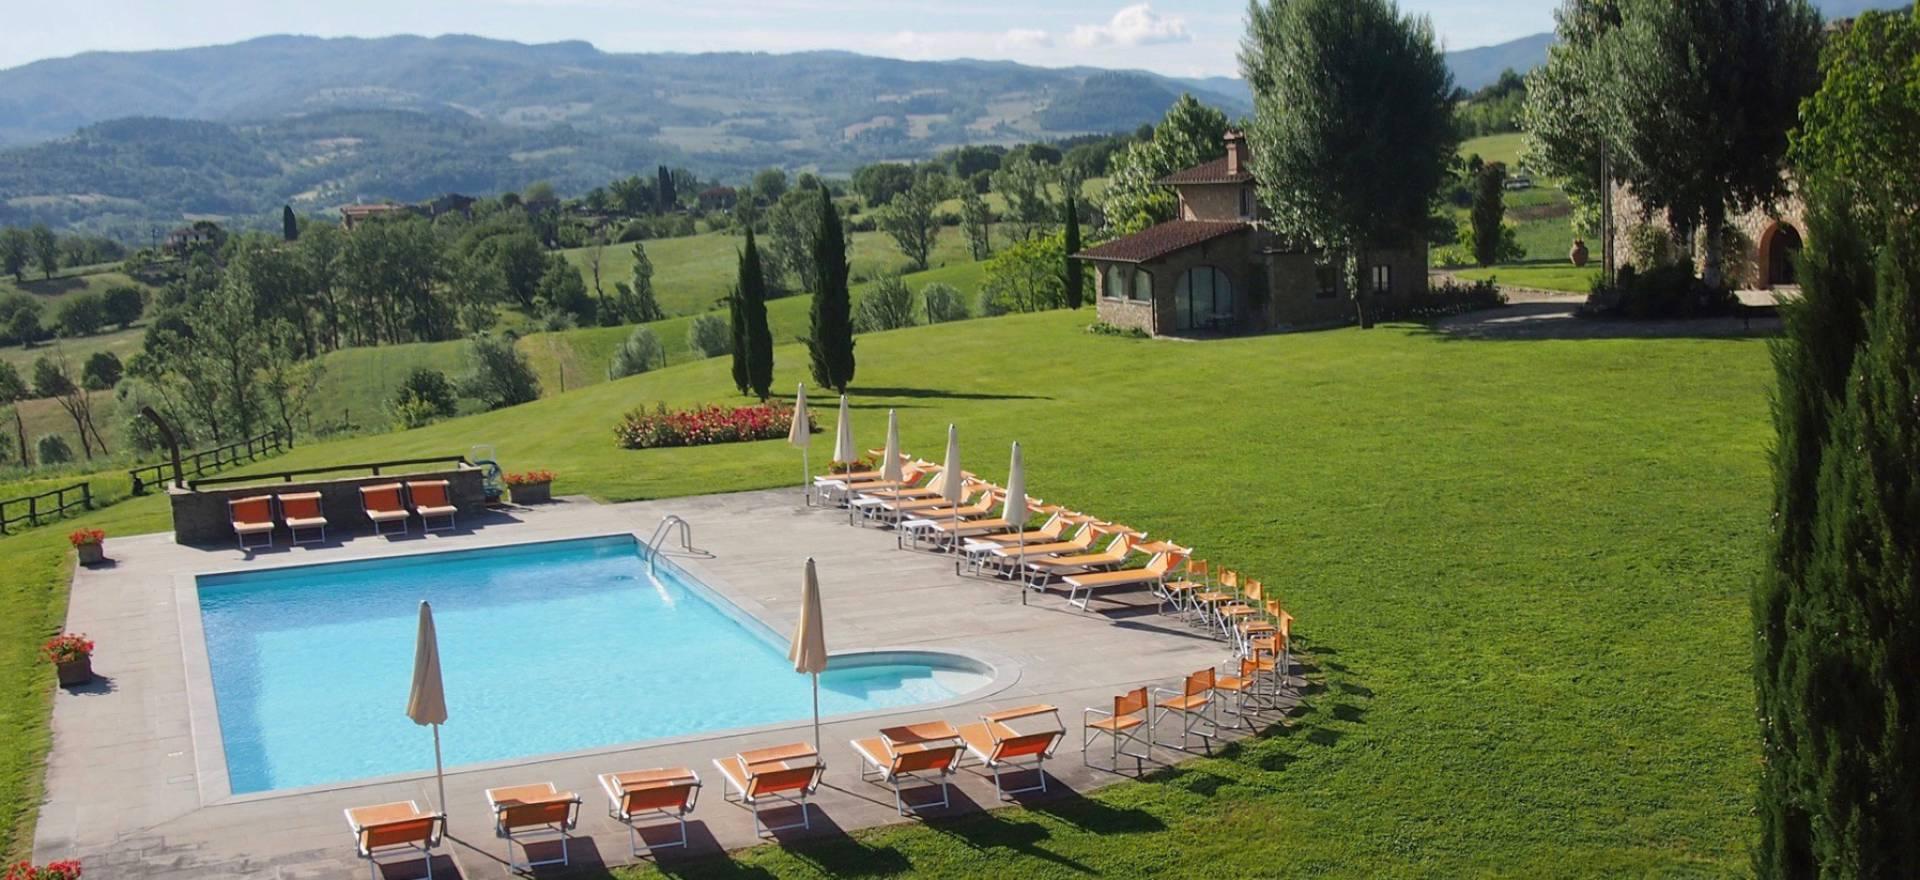 Agriturismo Toscane Agriturismo Toscane, zwembad en veel speelruimte